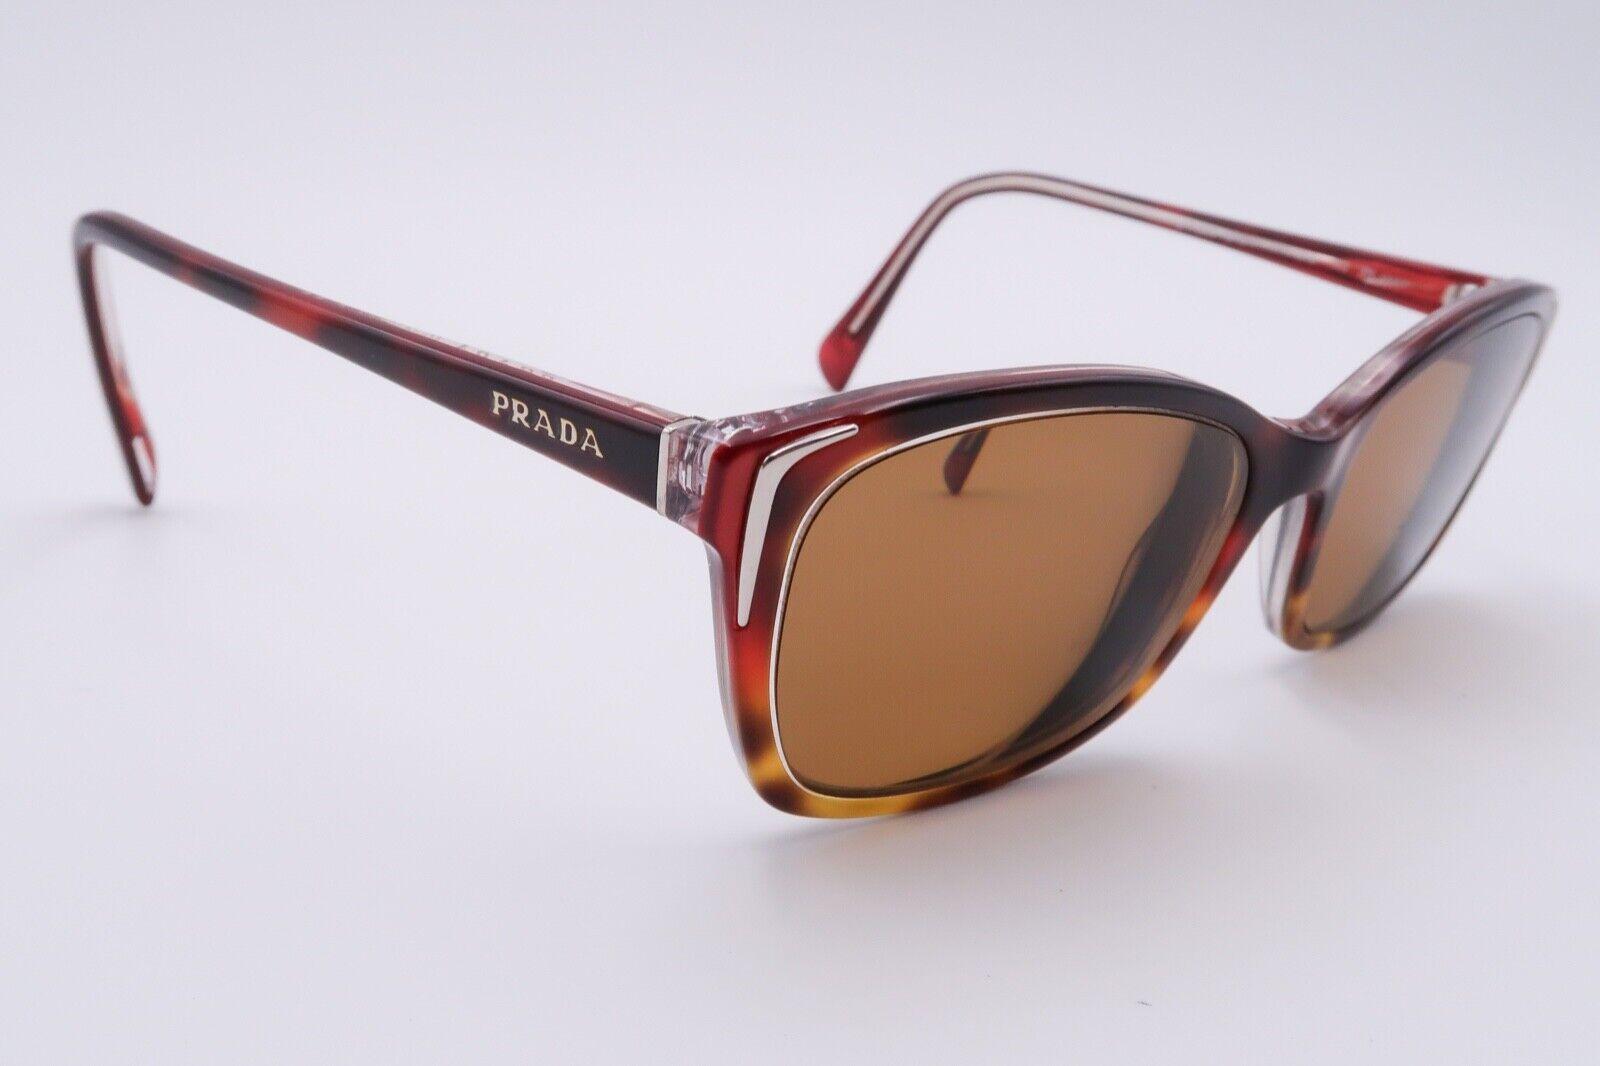 Prada SPR 02O Rx Sunglasses FRAMES Cat Eye 54[]17-140 Tortoise Brown Red D272